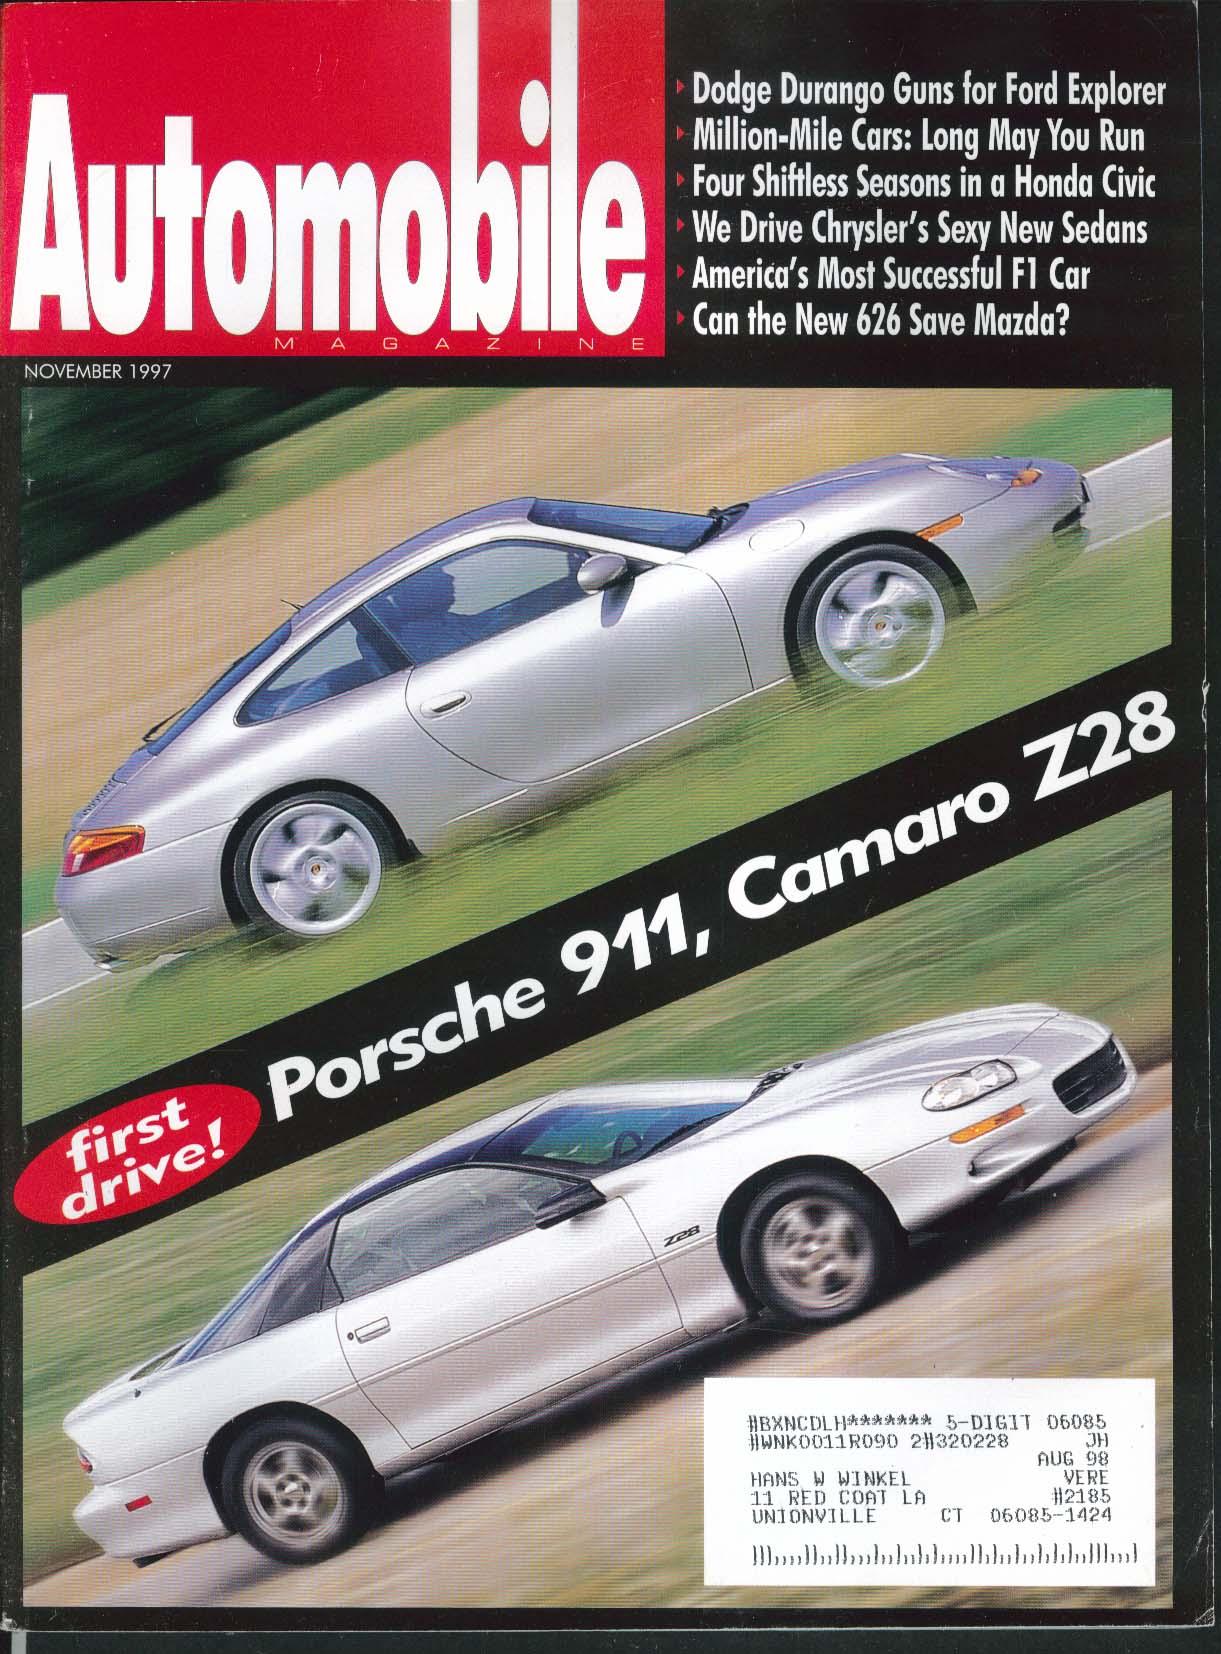 AUTOMOBILE Porsche 911 Camaro Z28 Dodge Durango Honda Civic Mazda 626 11 1997